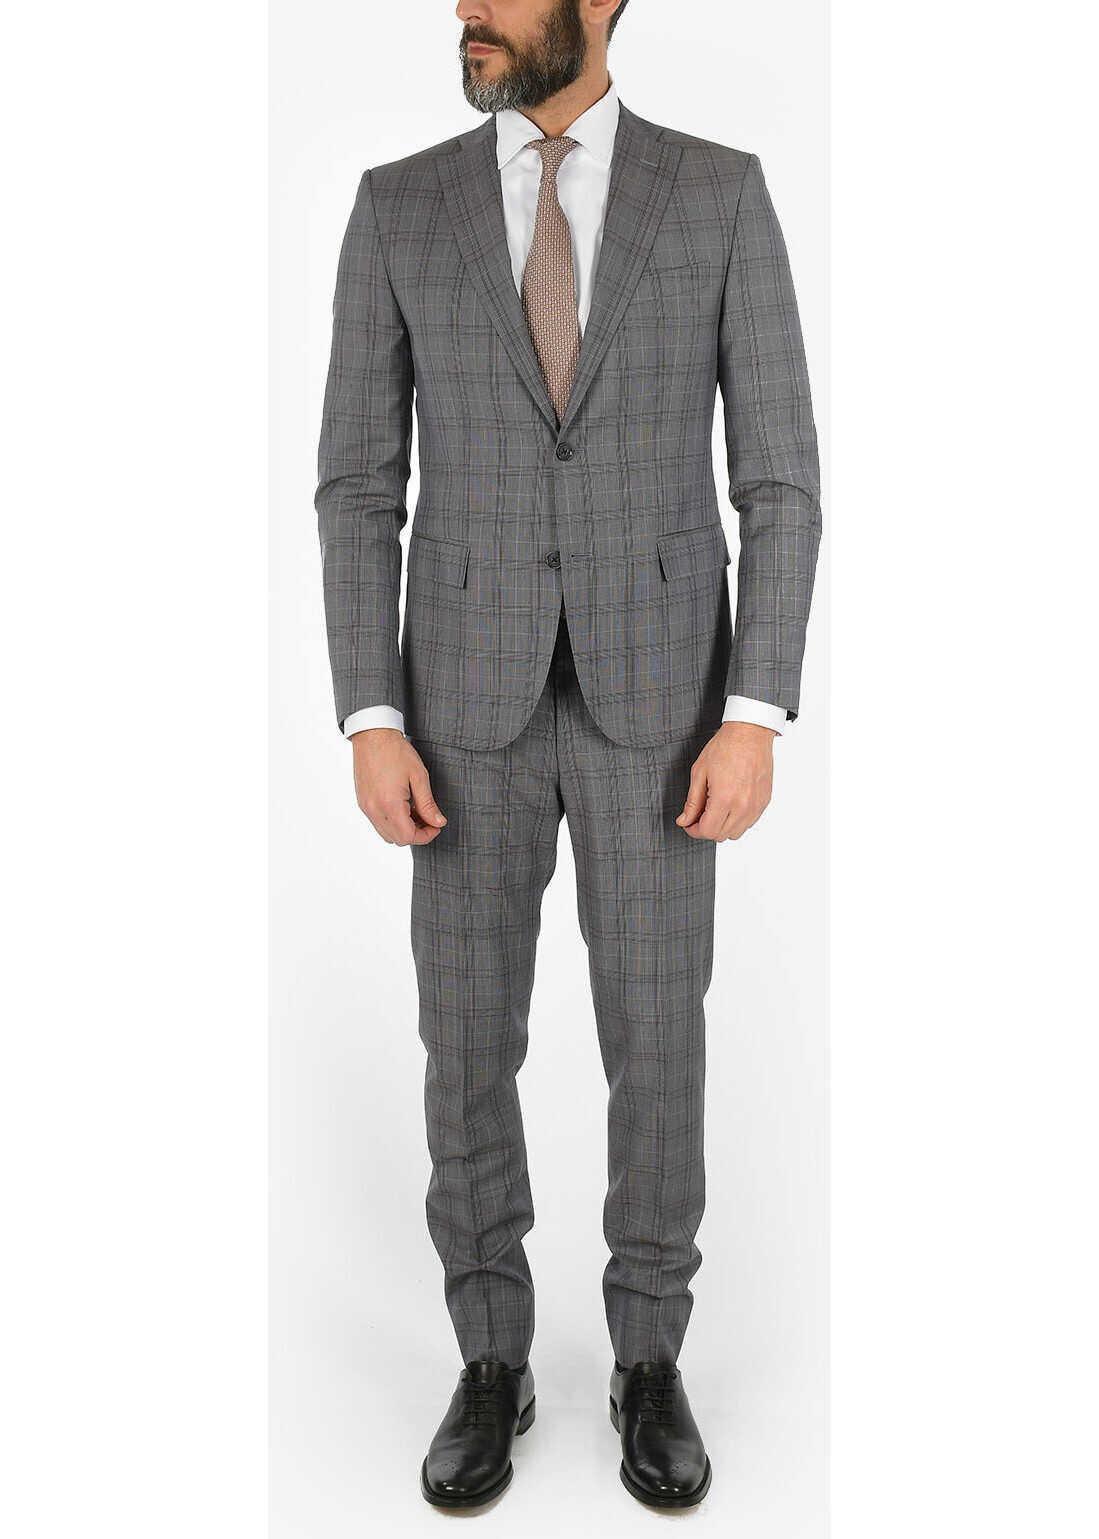 CORNELIANI CC COLLECTION RESET plaid virgin wool suit GRAY imagine